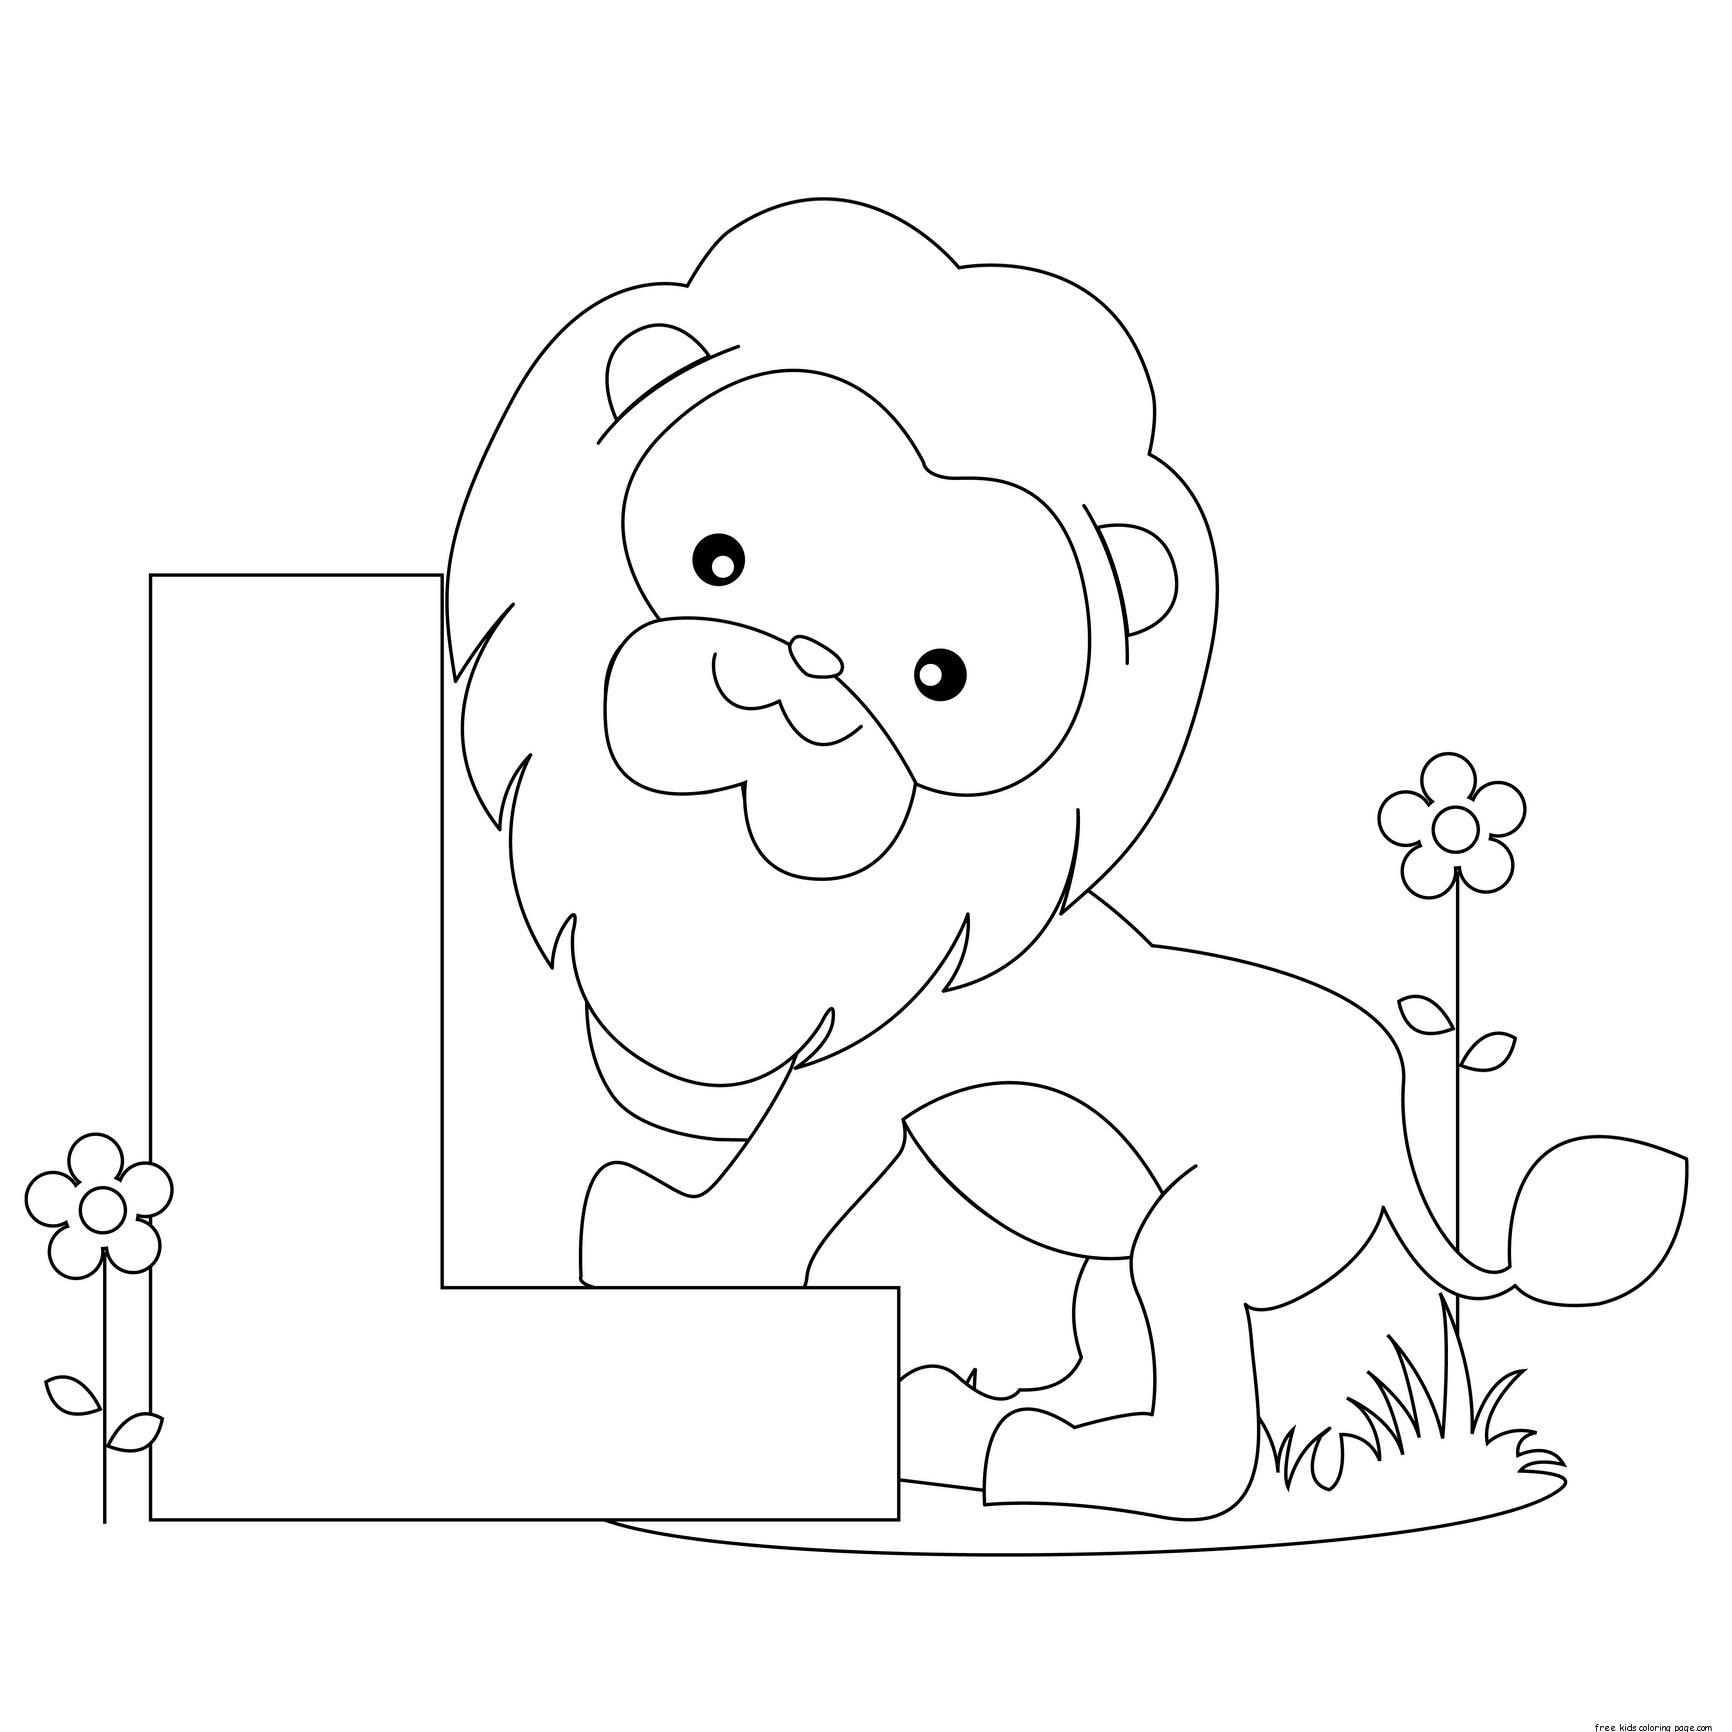 Printable Animal Alphabet Letter L Is For Lion